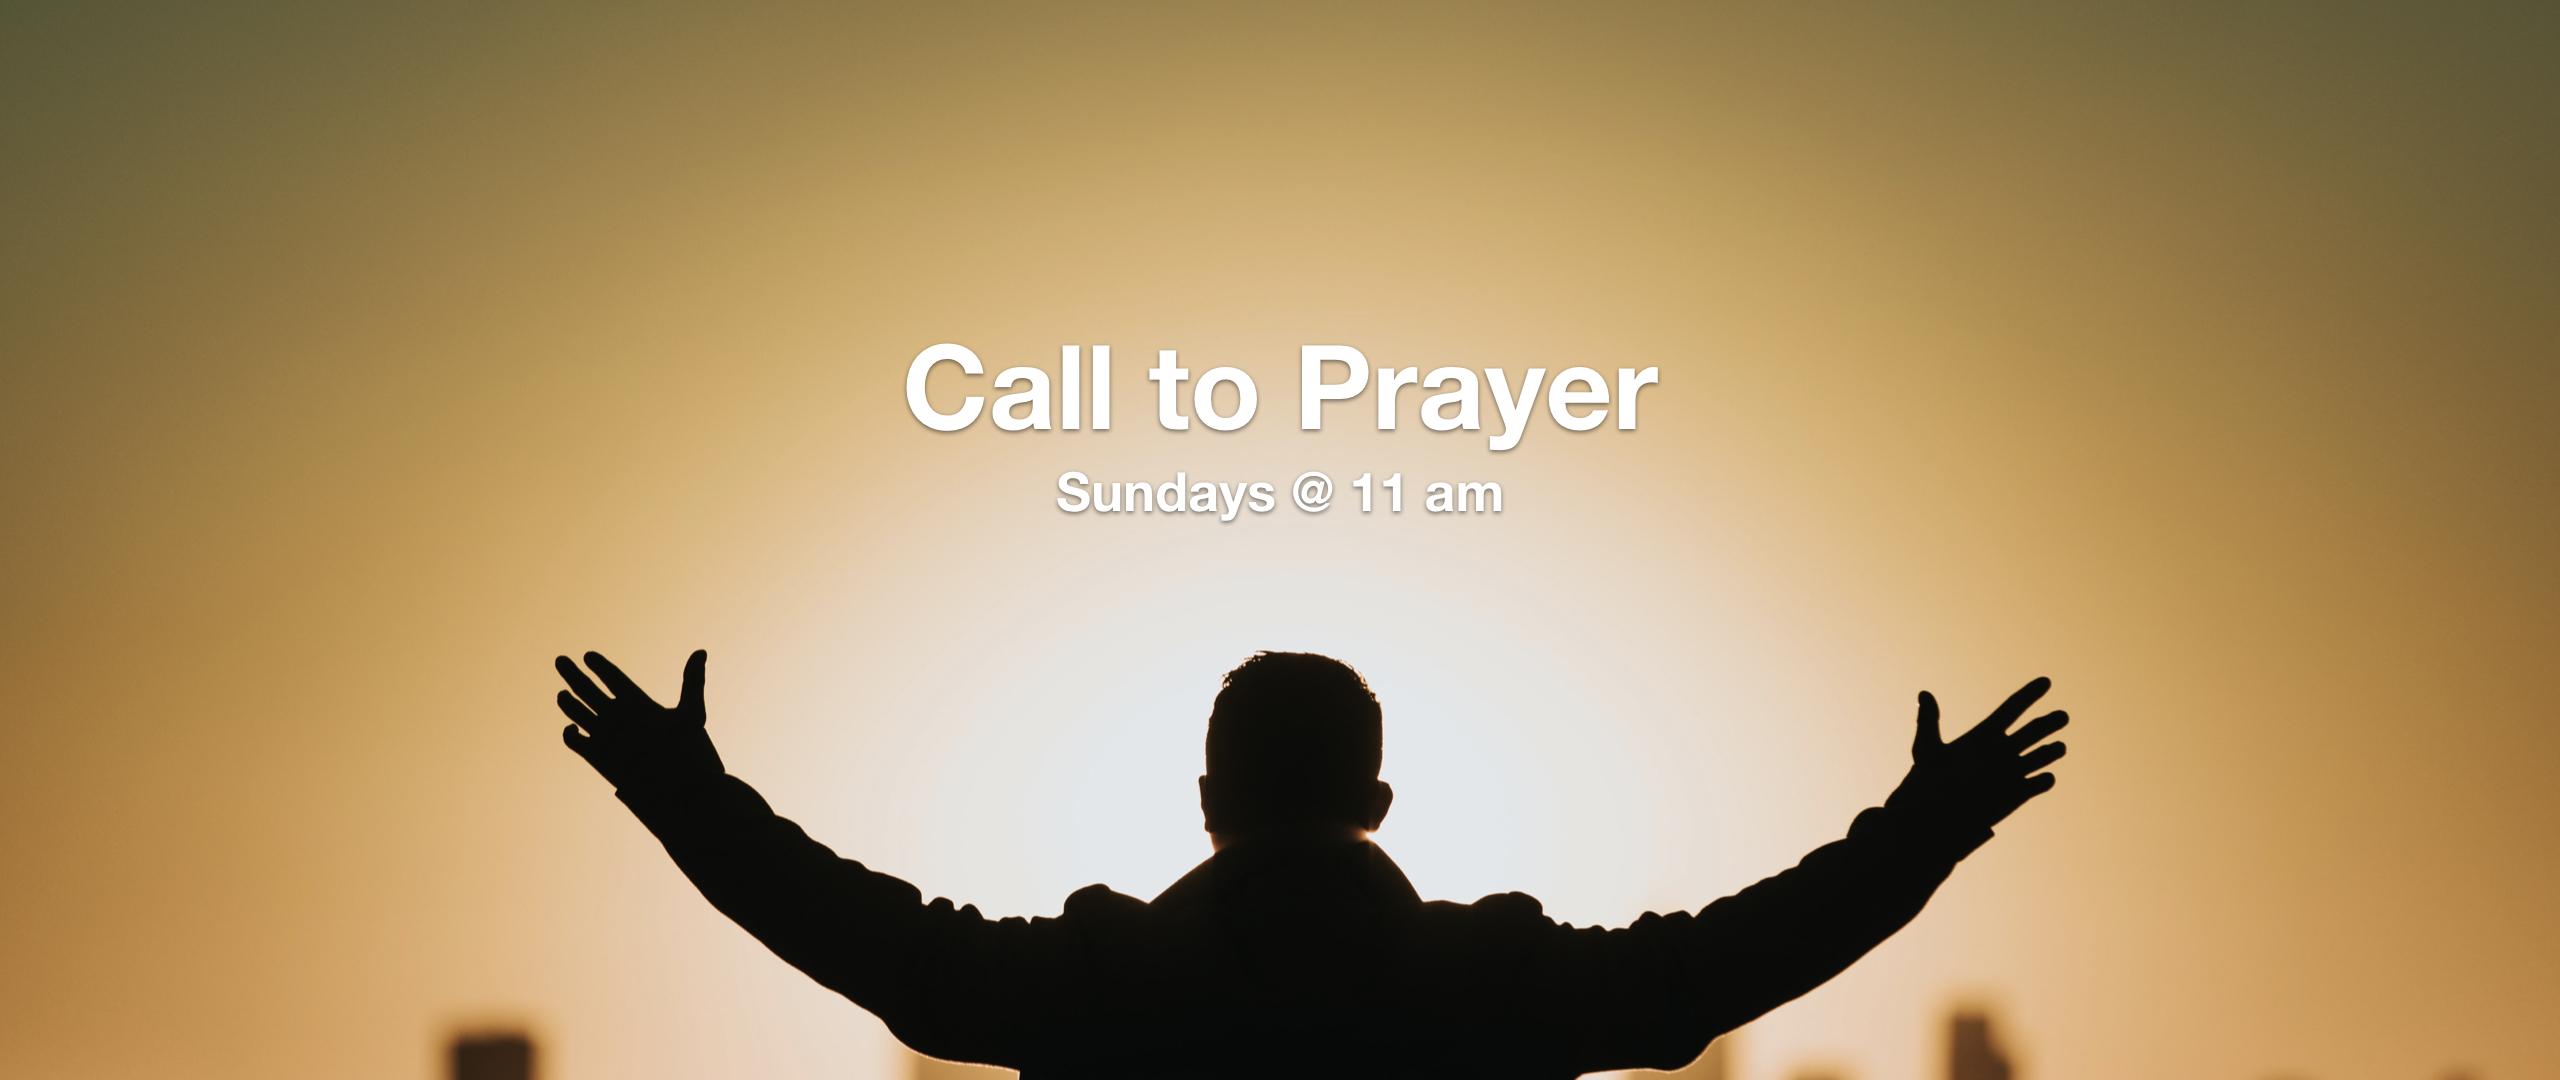 CALL TO PRAYER WEB.001